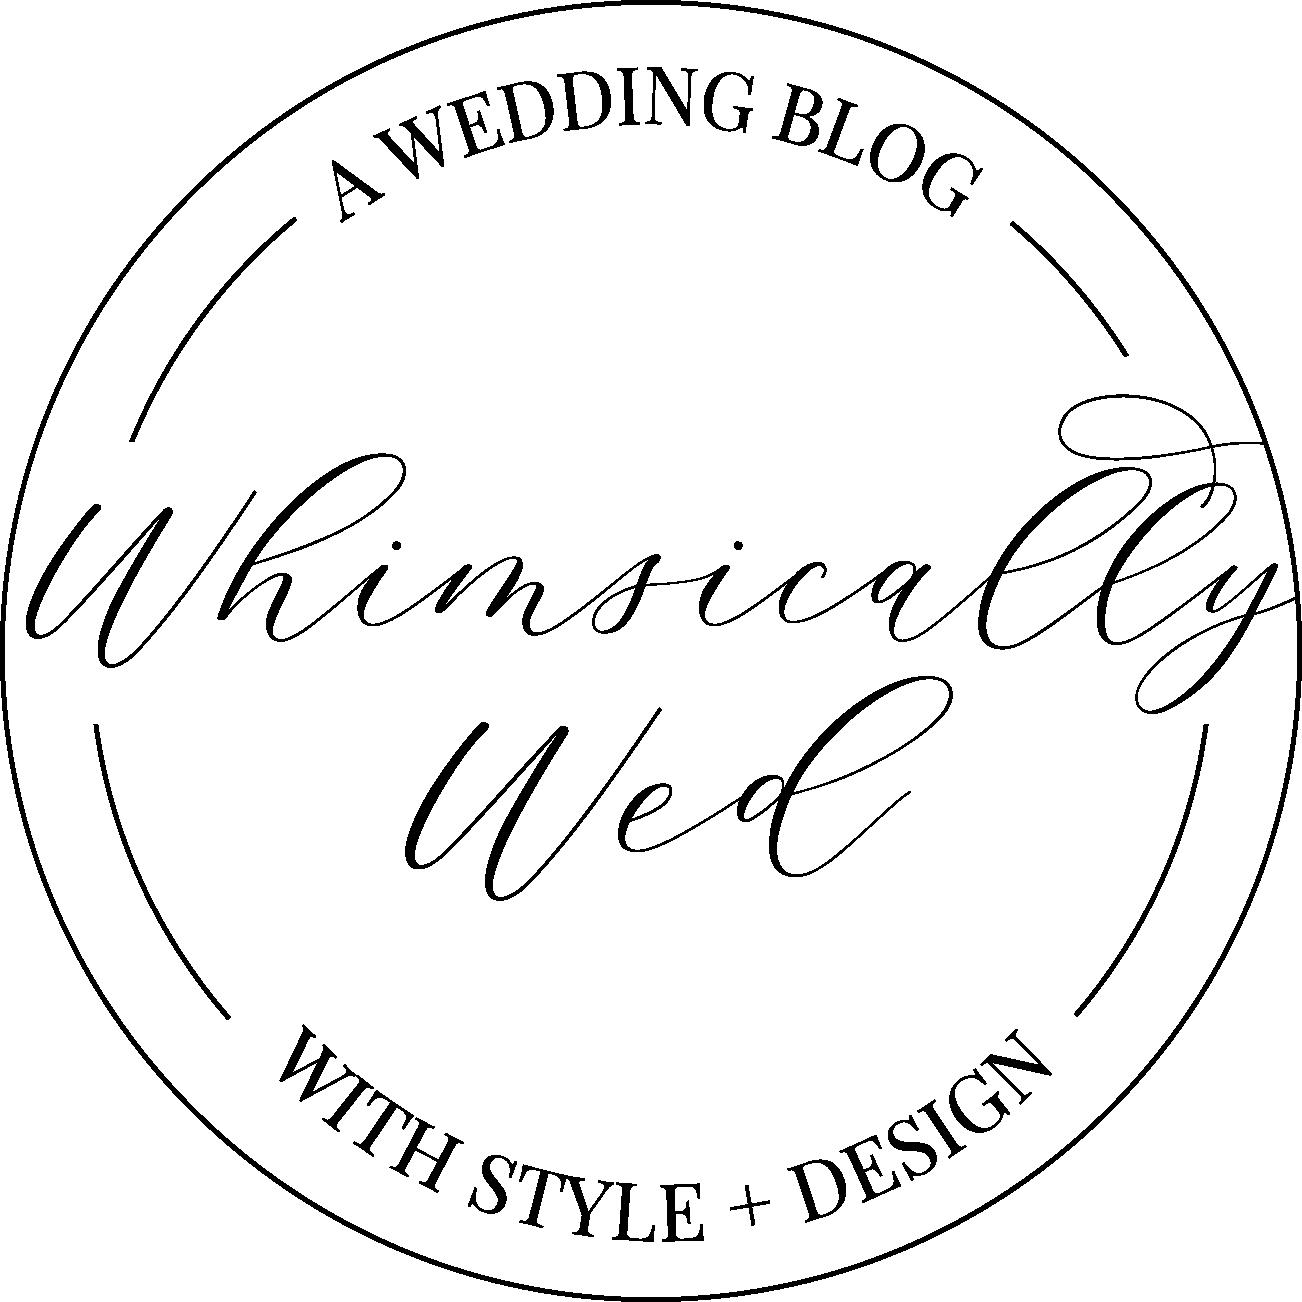 41ptgdl1nbd8 (1).png